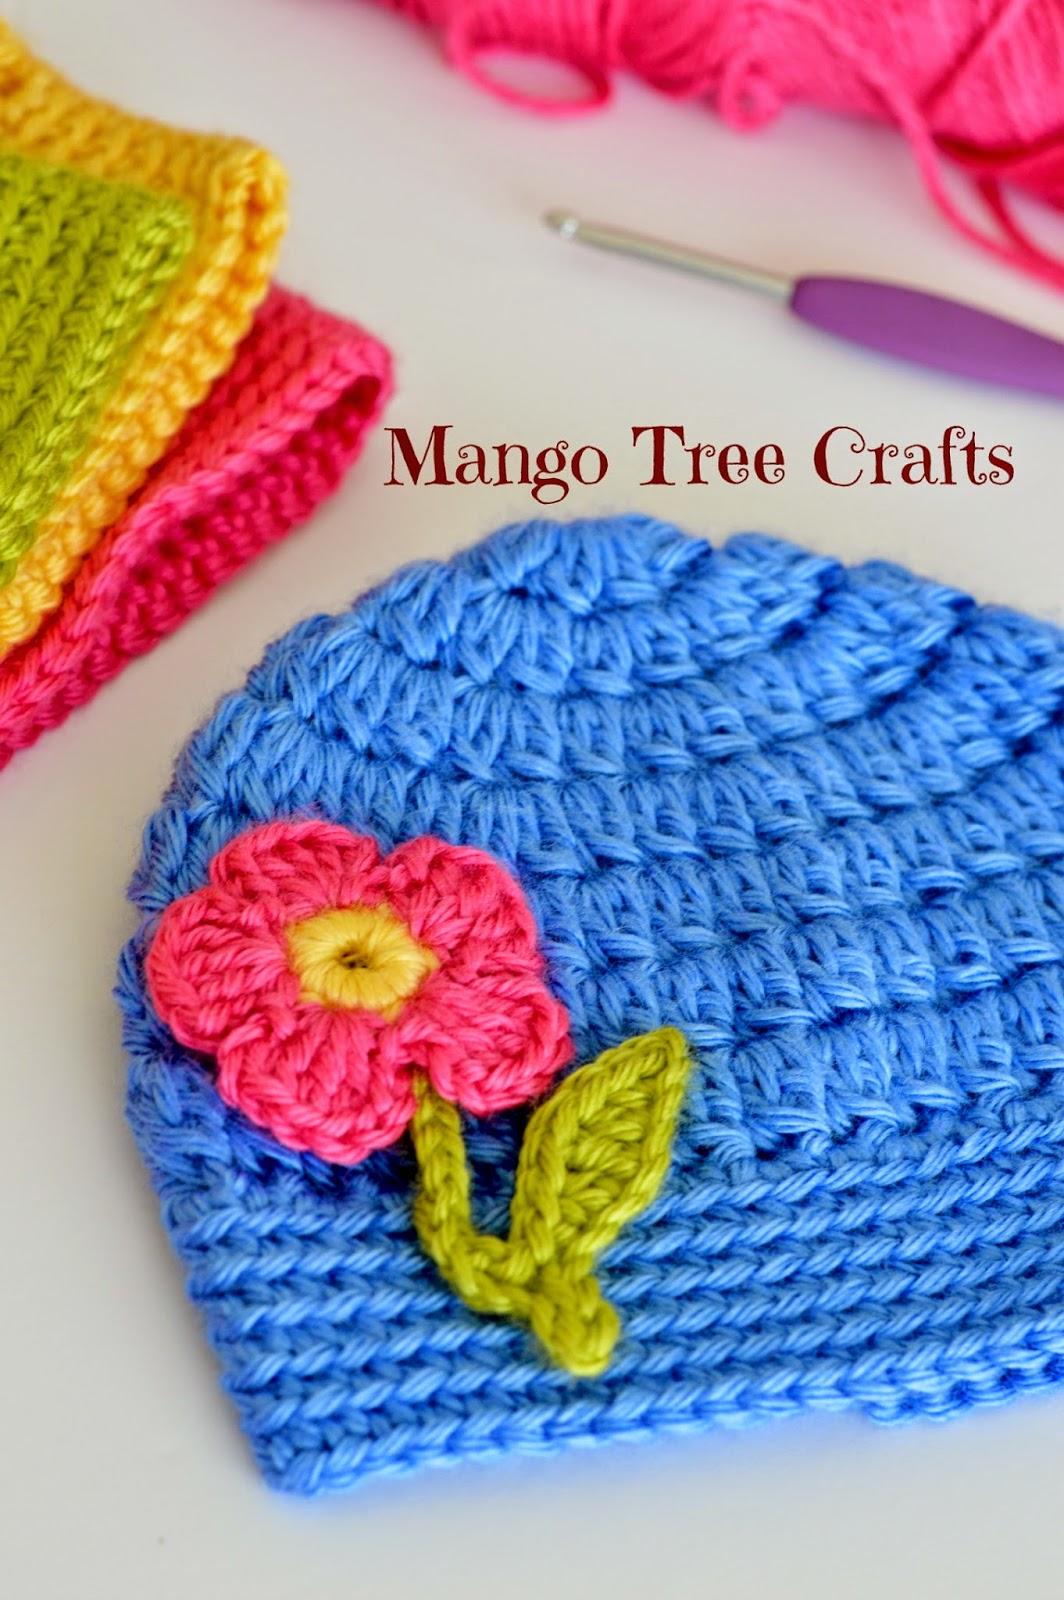 All Crochet Patterns : Mango Tree Crafts: Free Basic Beanie Crochet Pattern All Sizes